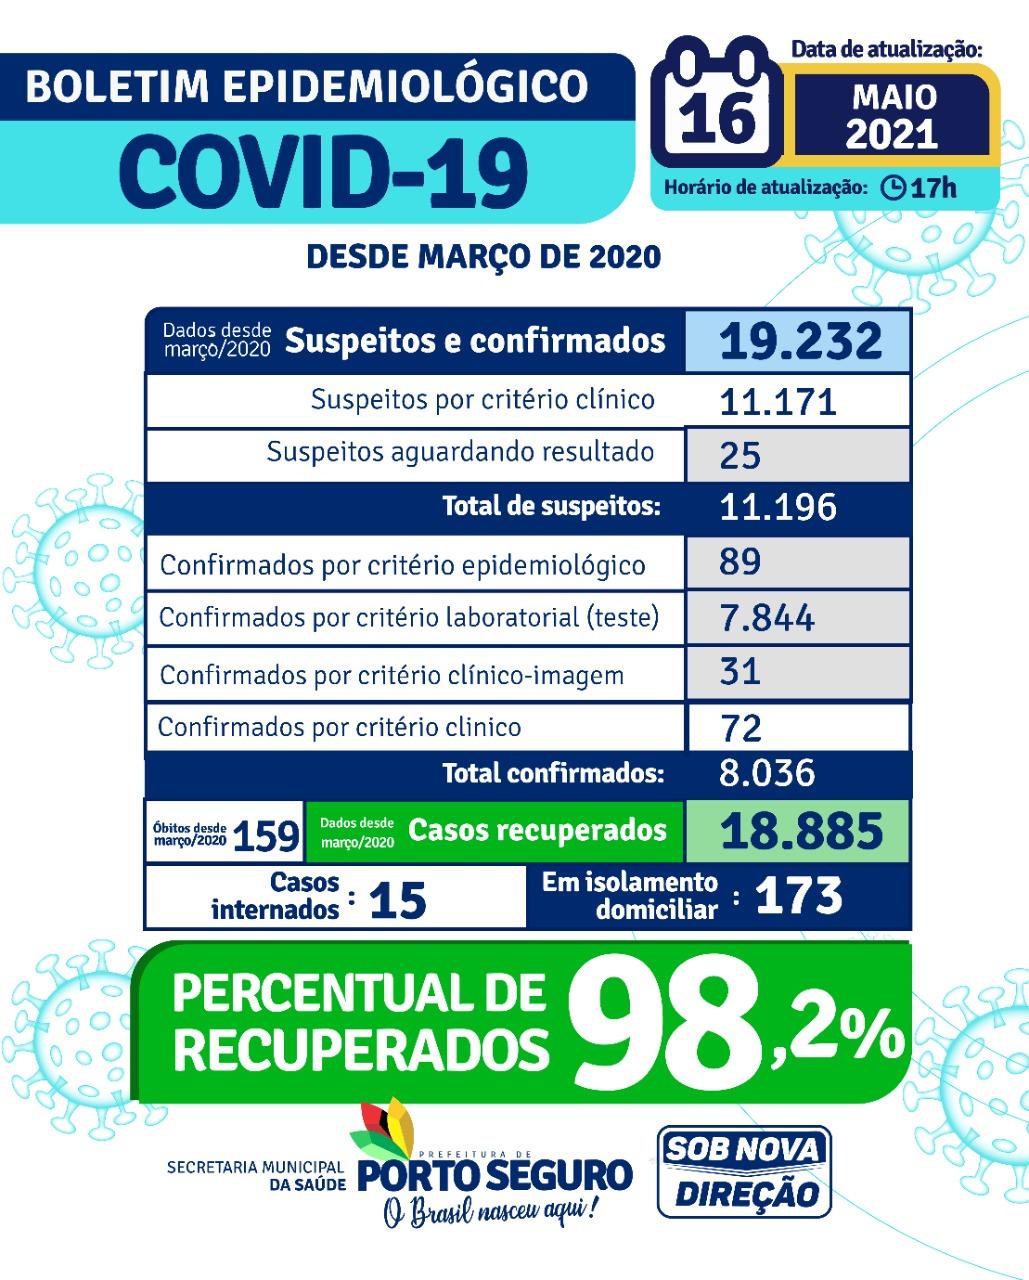 Porto Seguro: Boletim Epidemiológico Covid-19 (16/05/2021) 23